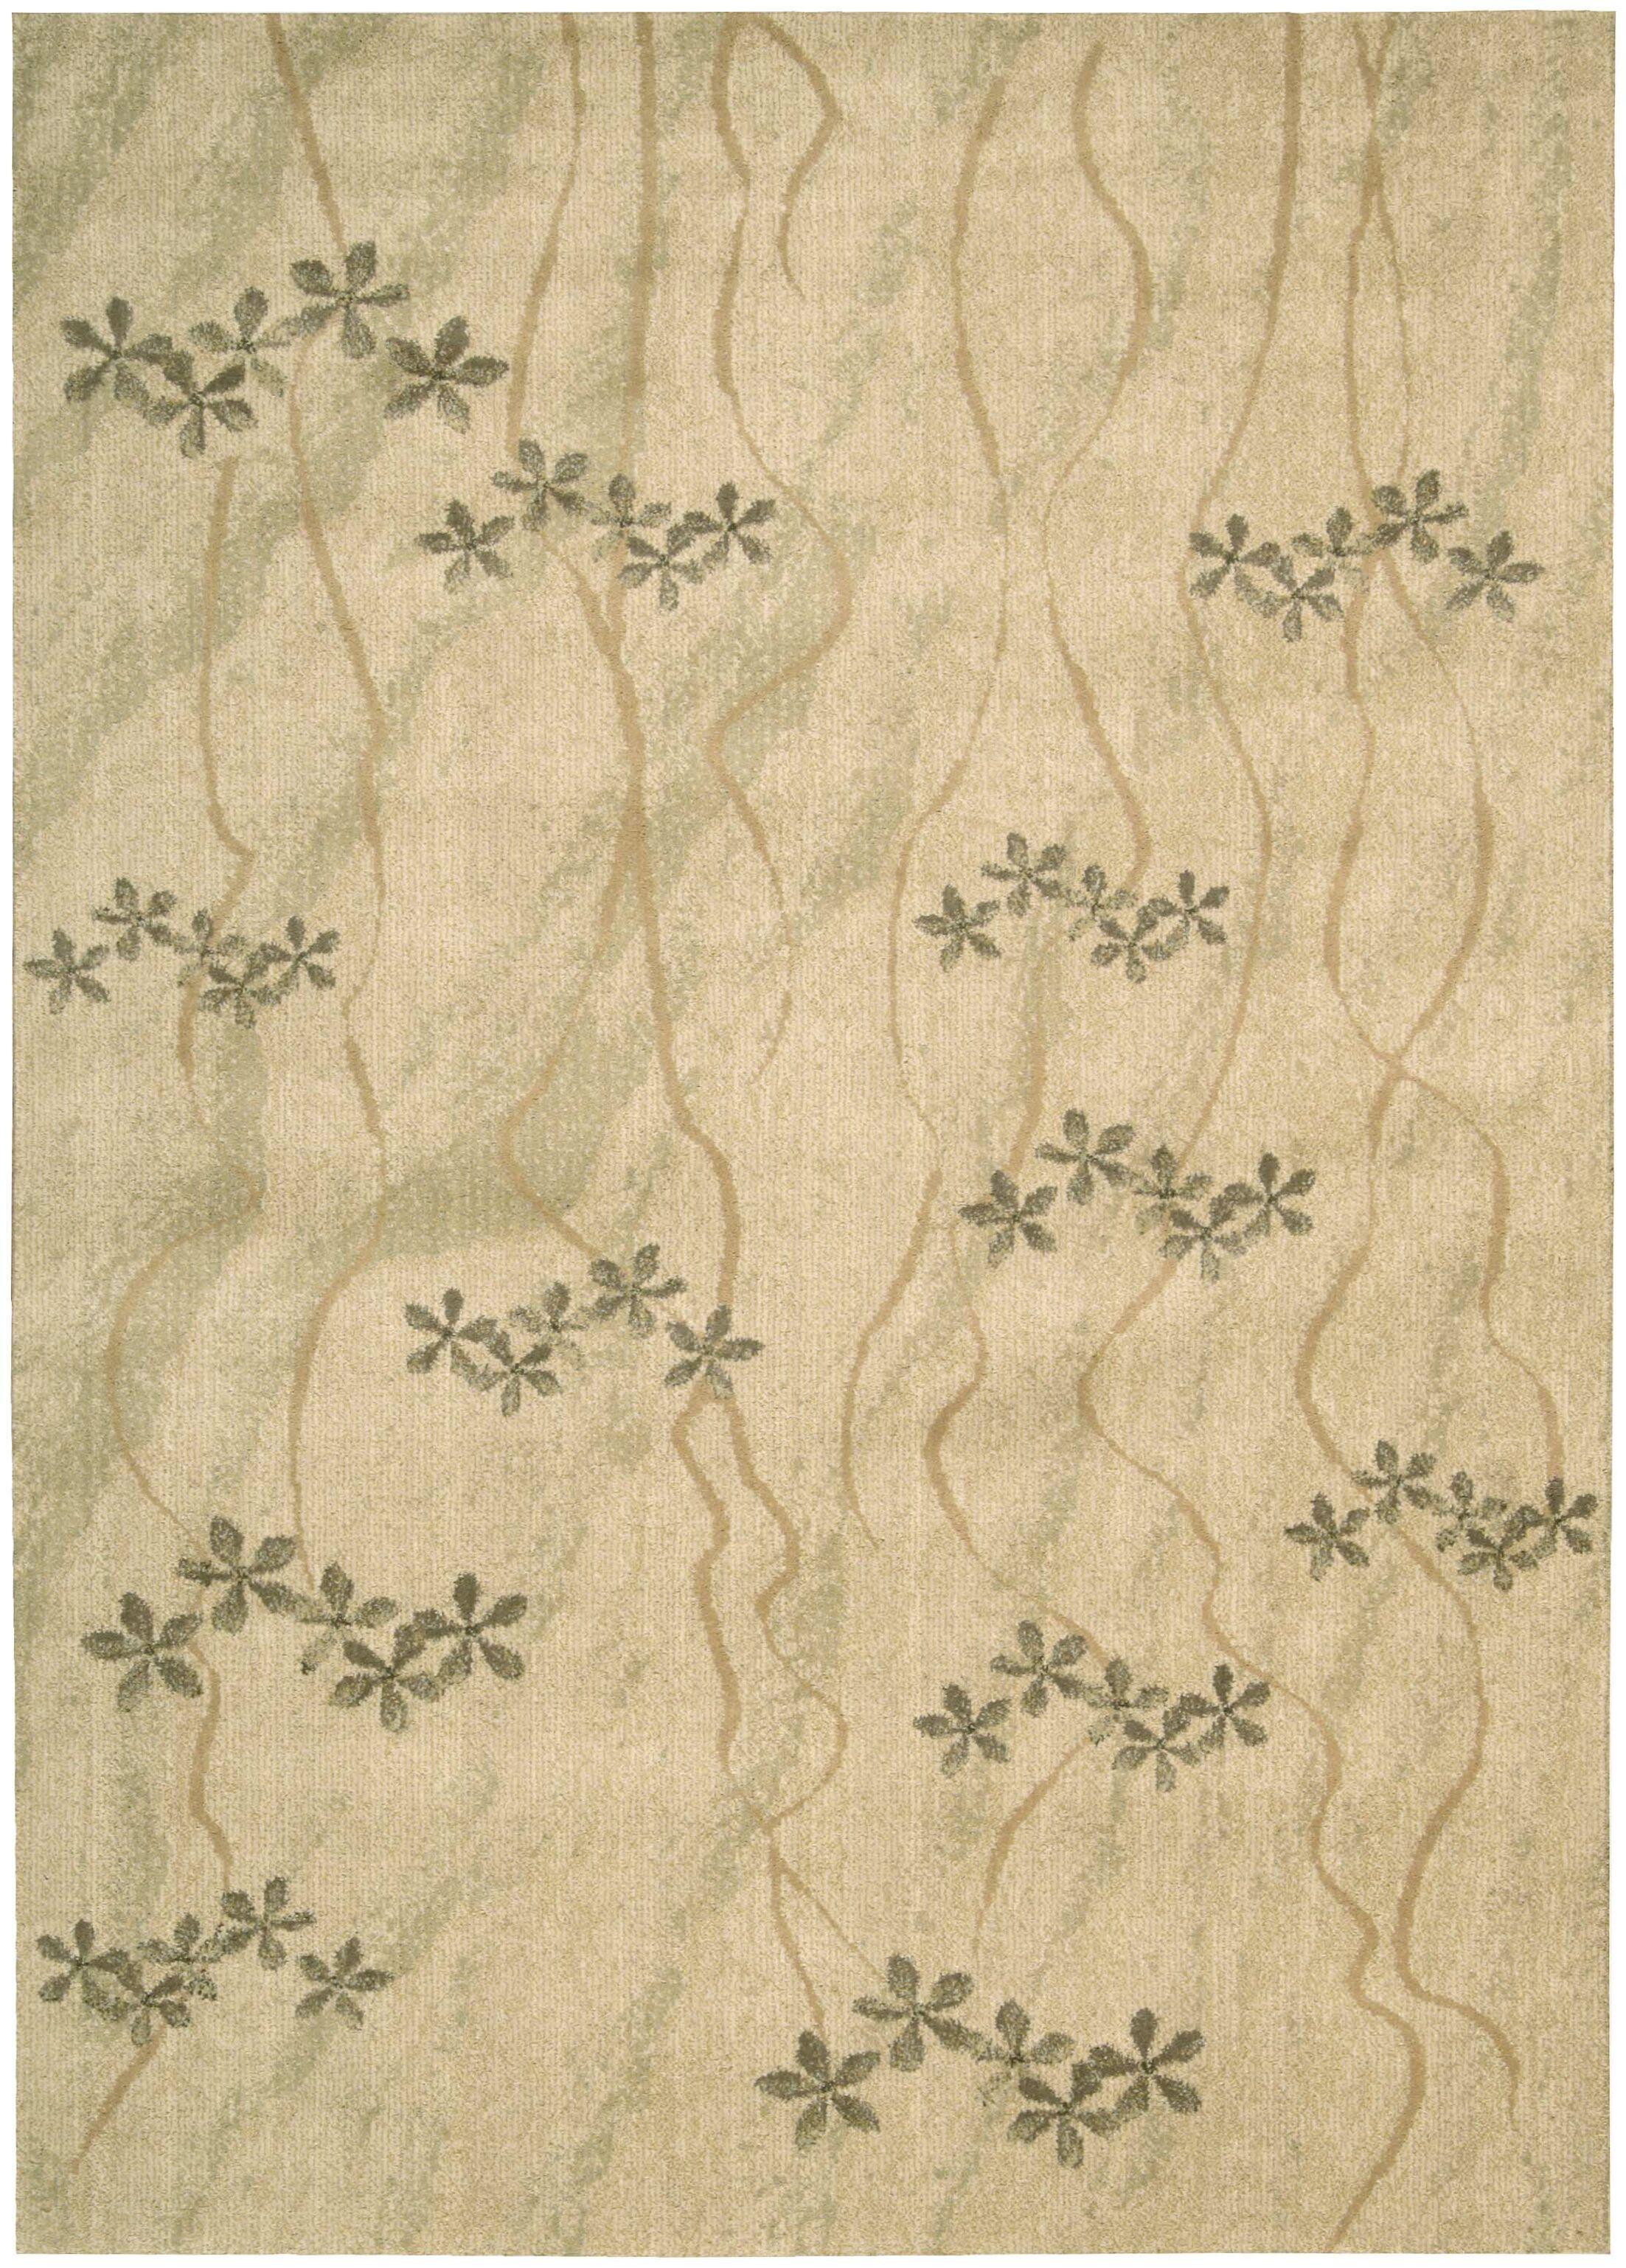 CK 14 Woven Textures Beige Area Rug Rug Size: Rectangle 3'6